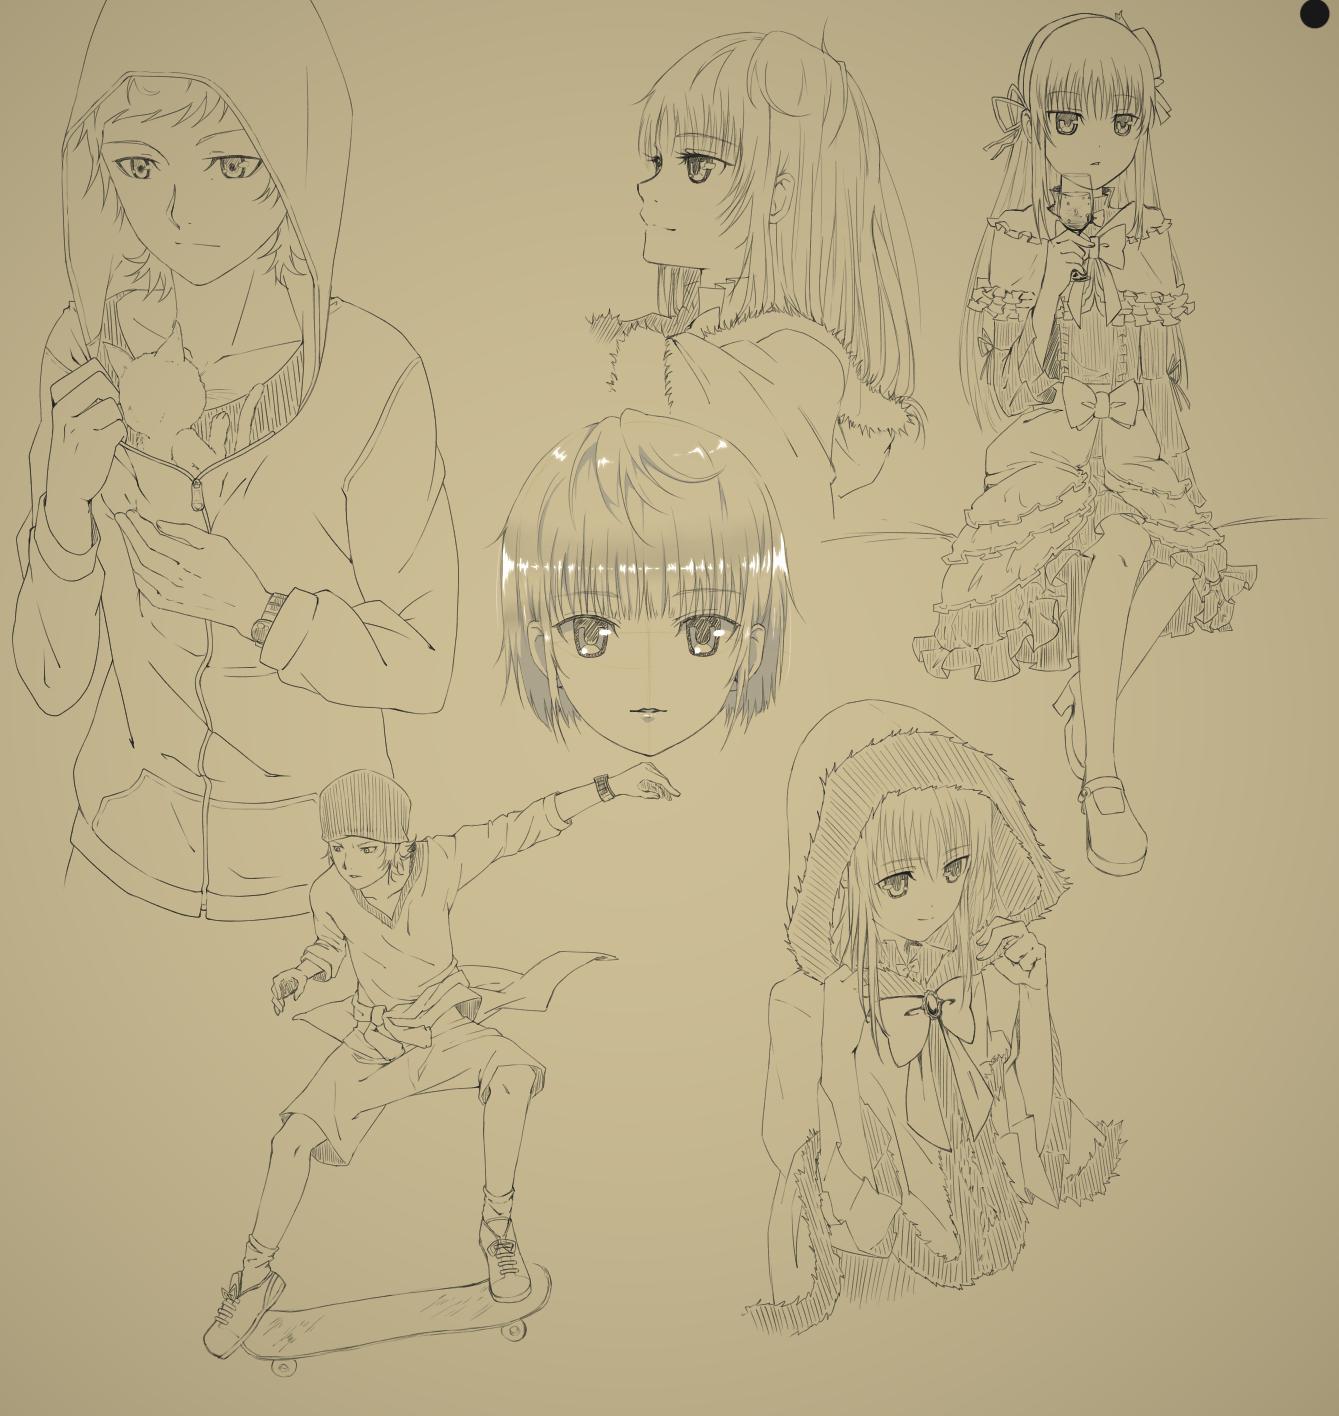 Yata Anna Sketch by Gurvana